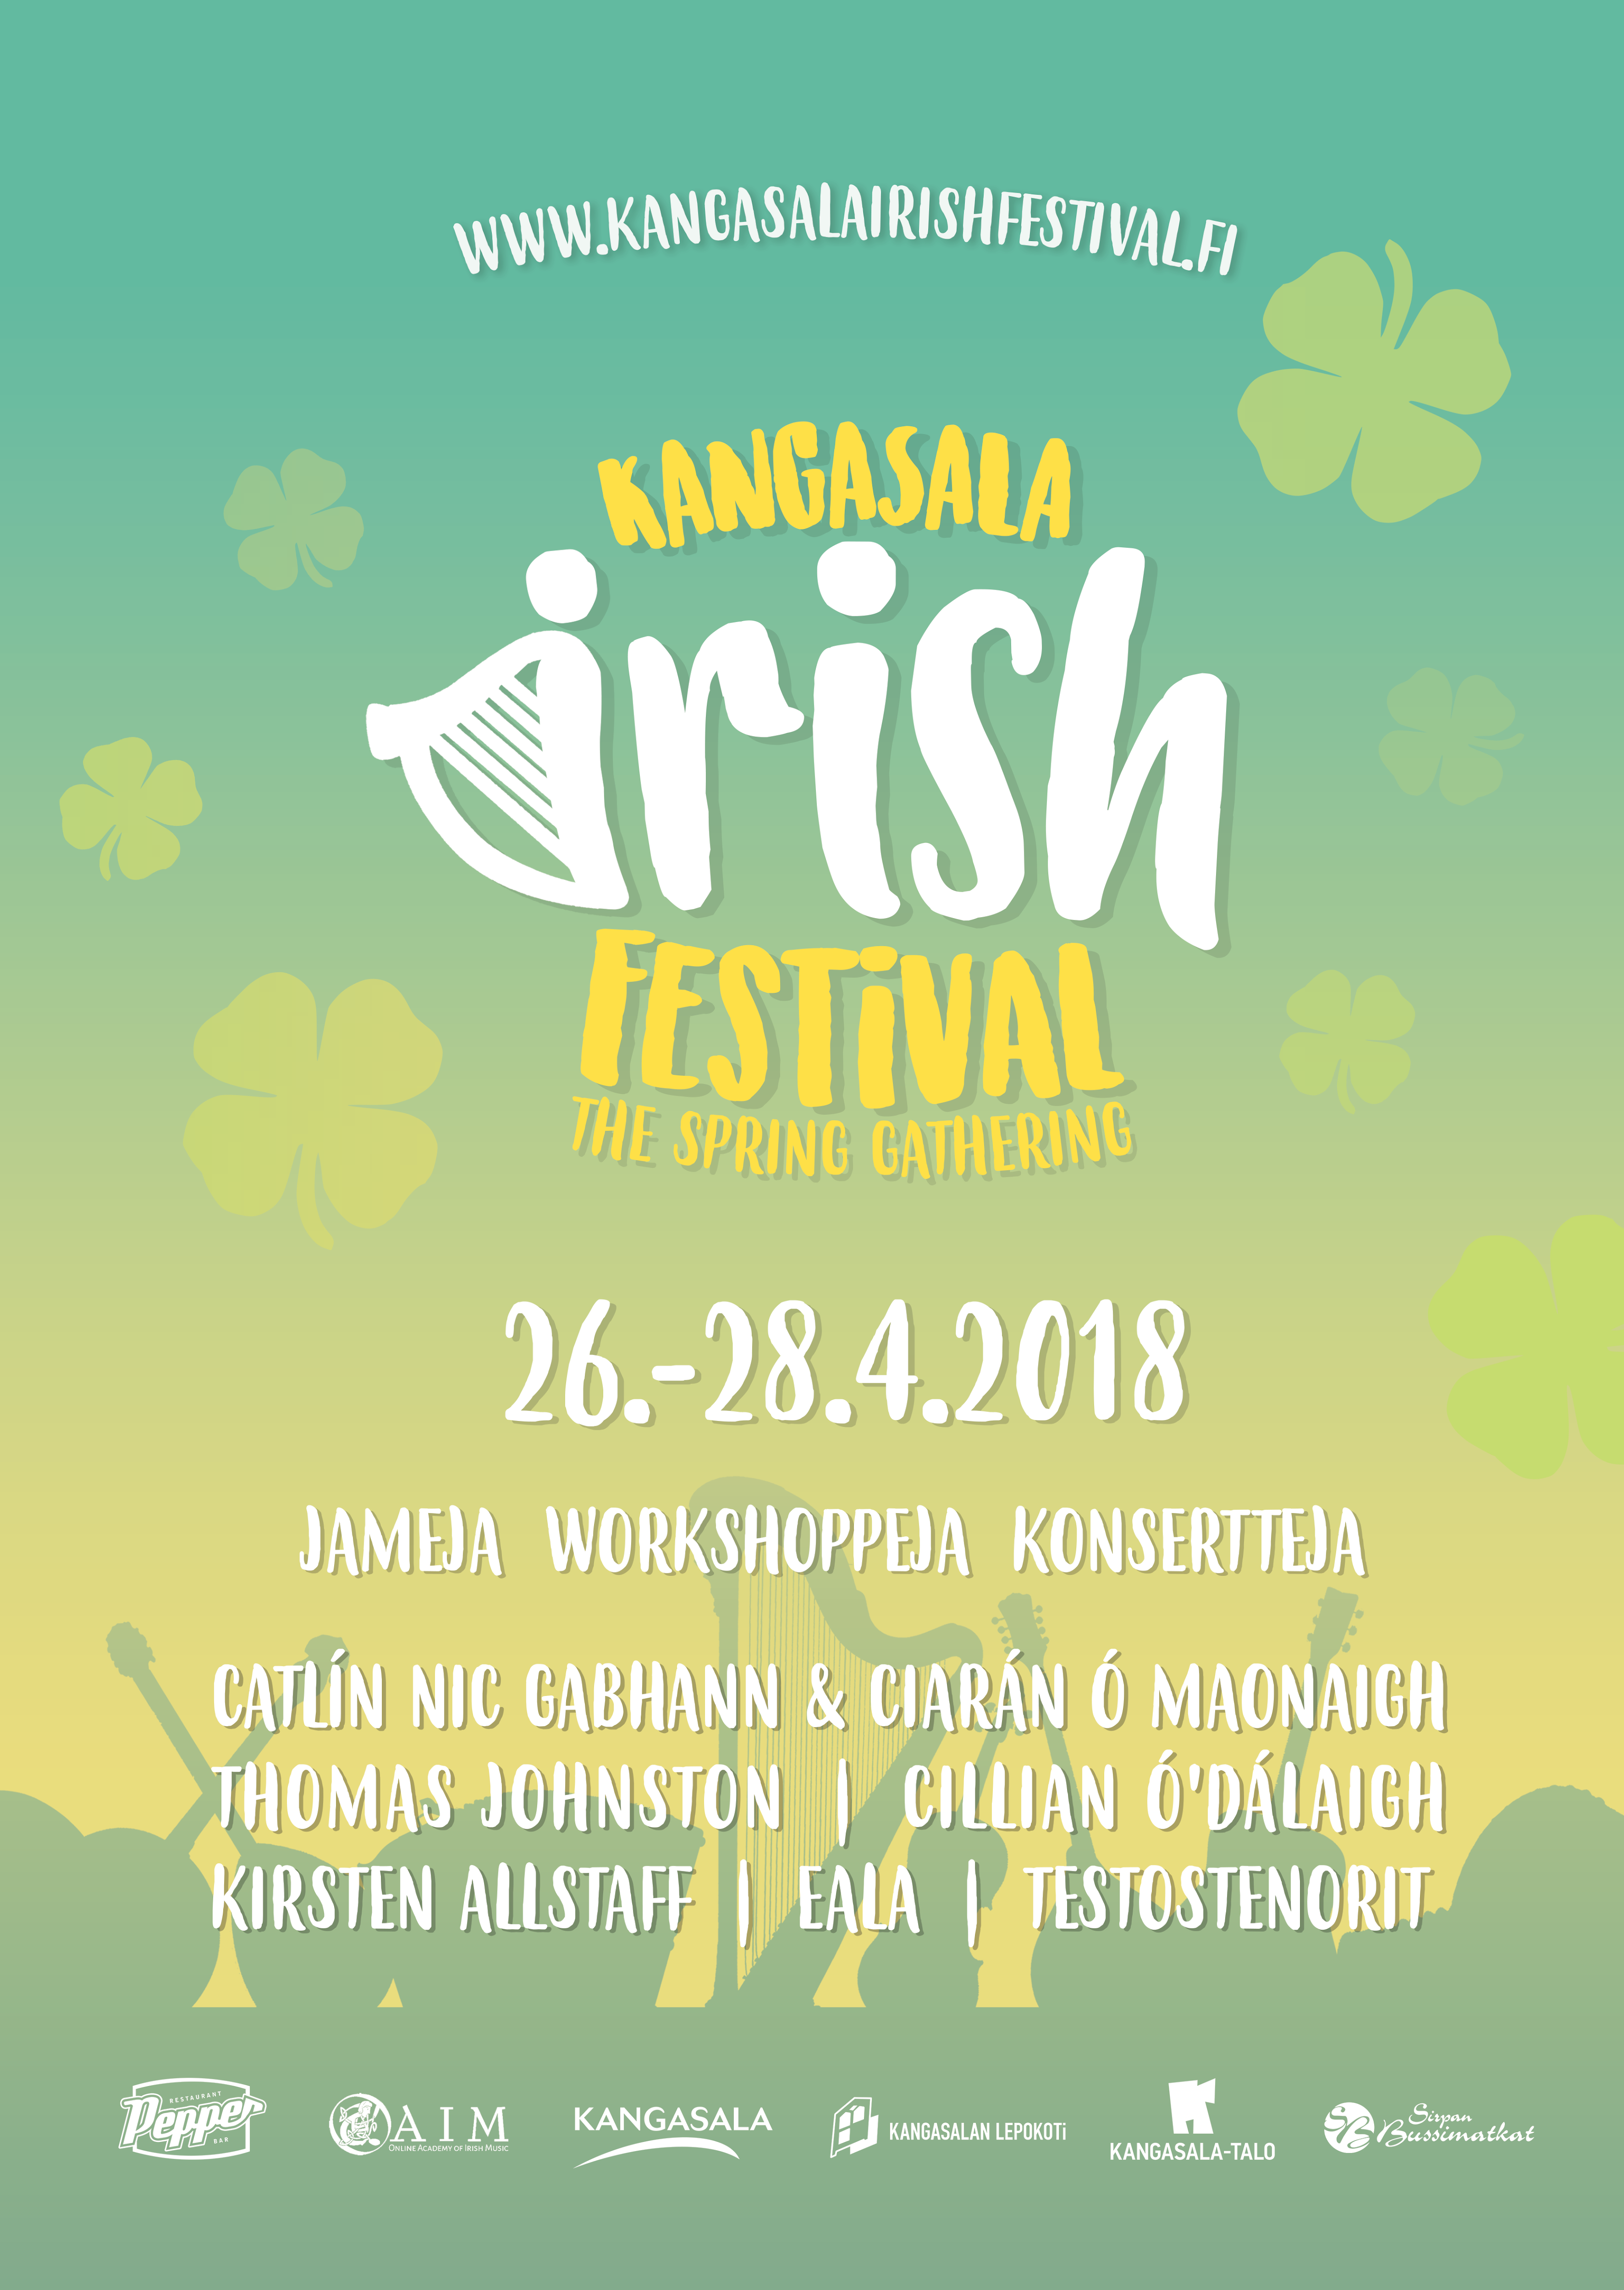 Kangasala Irish Festival